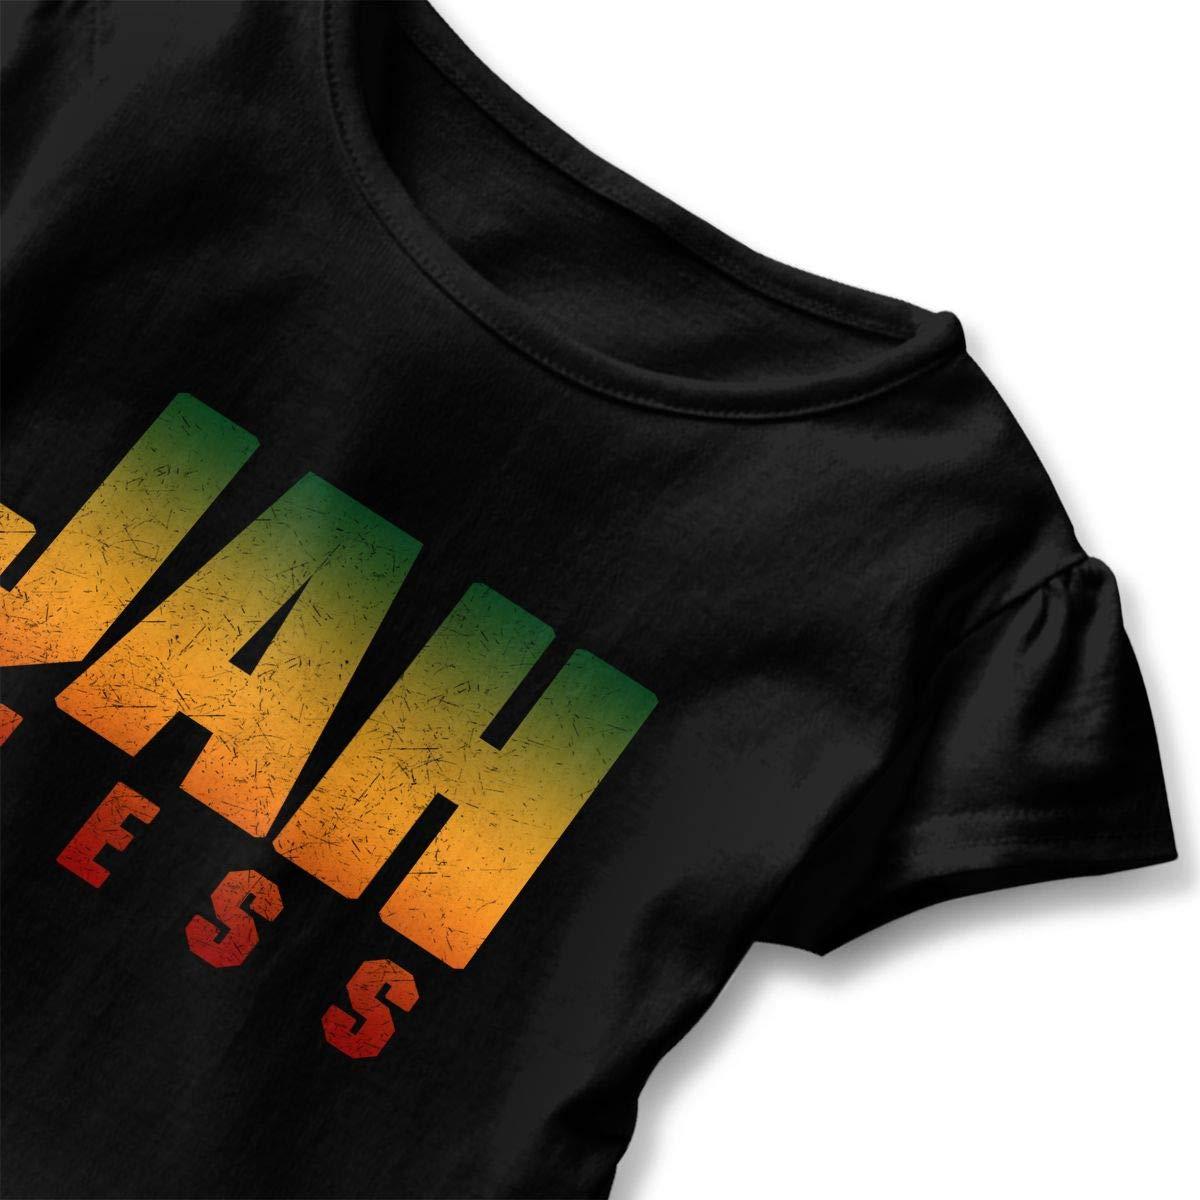 Clarissa Bertha Jah Bless Rasta Flag Reggae Roots Toddler Baby Girls Short Sleeve Ruffle T-Shirt